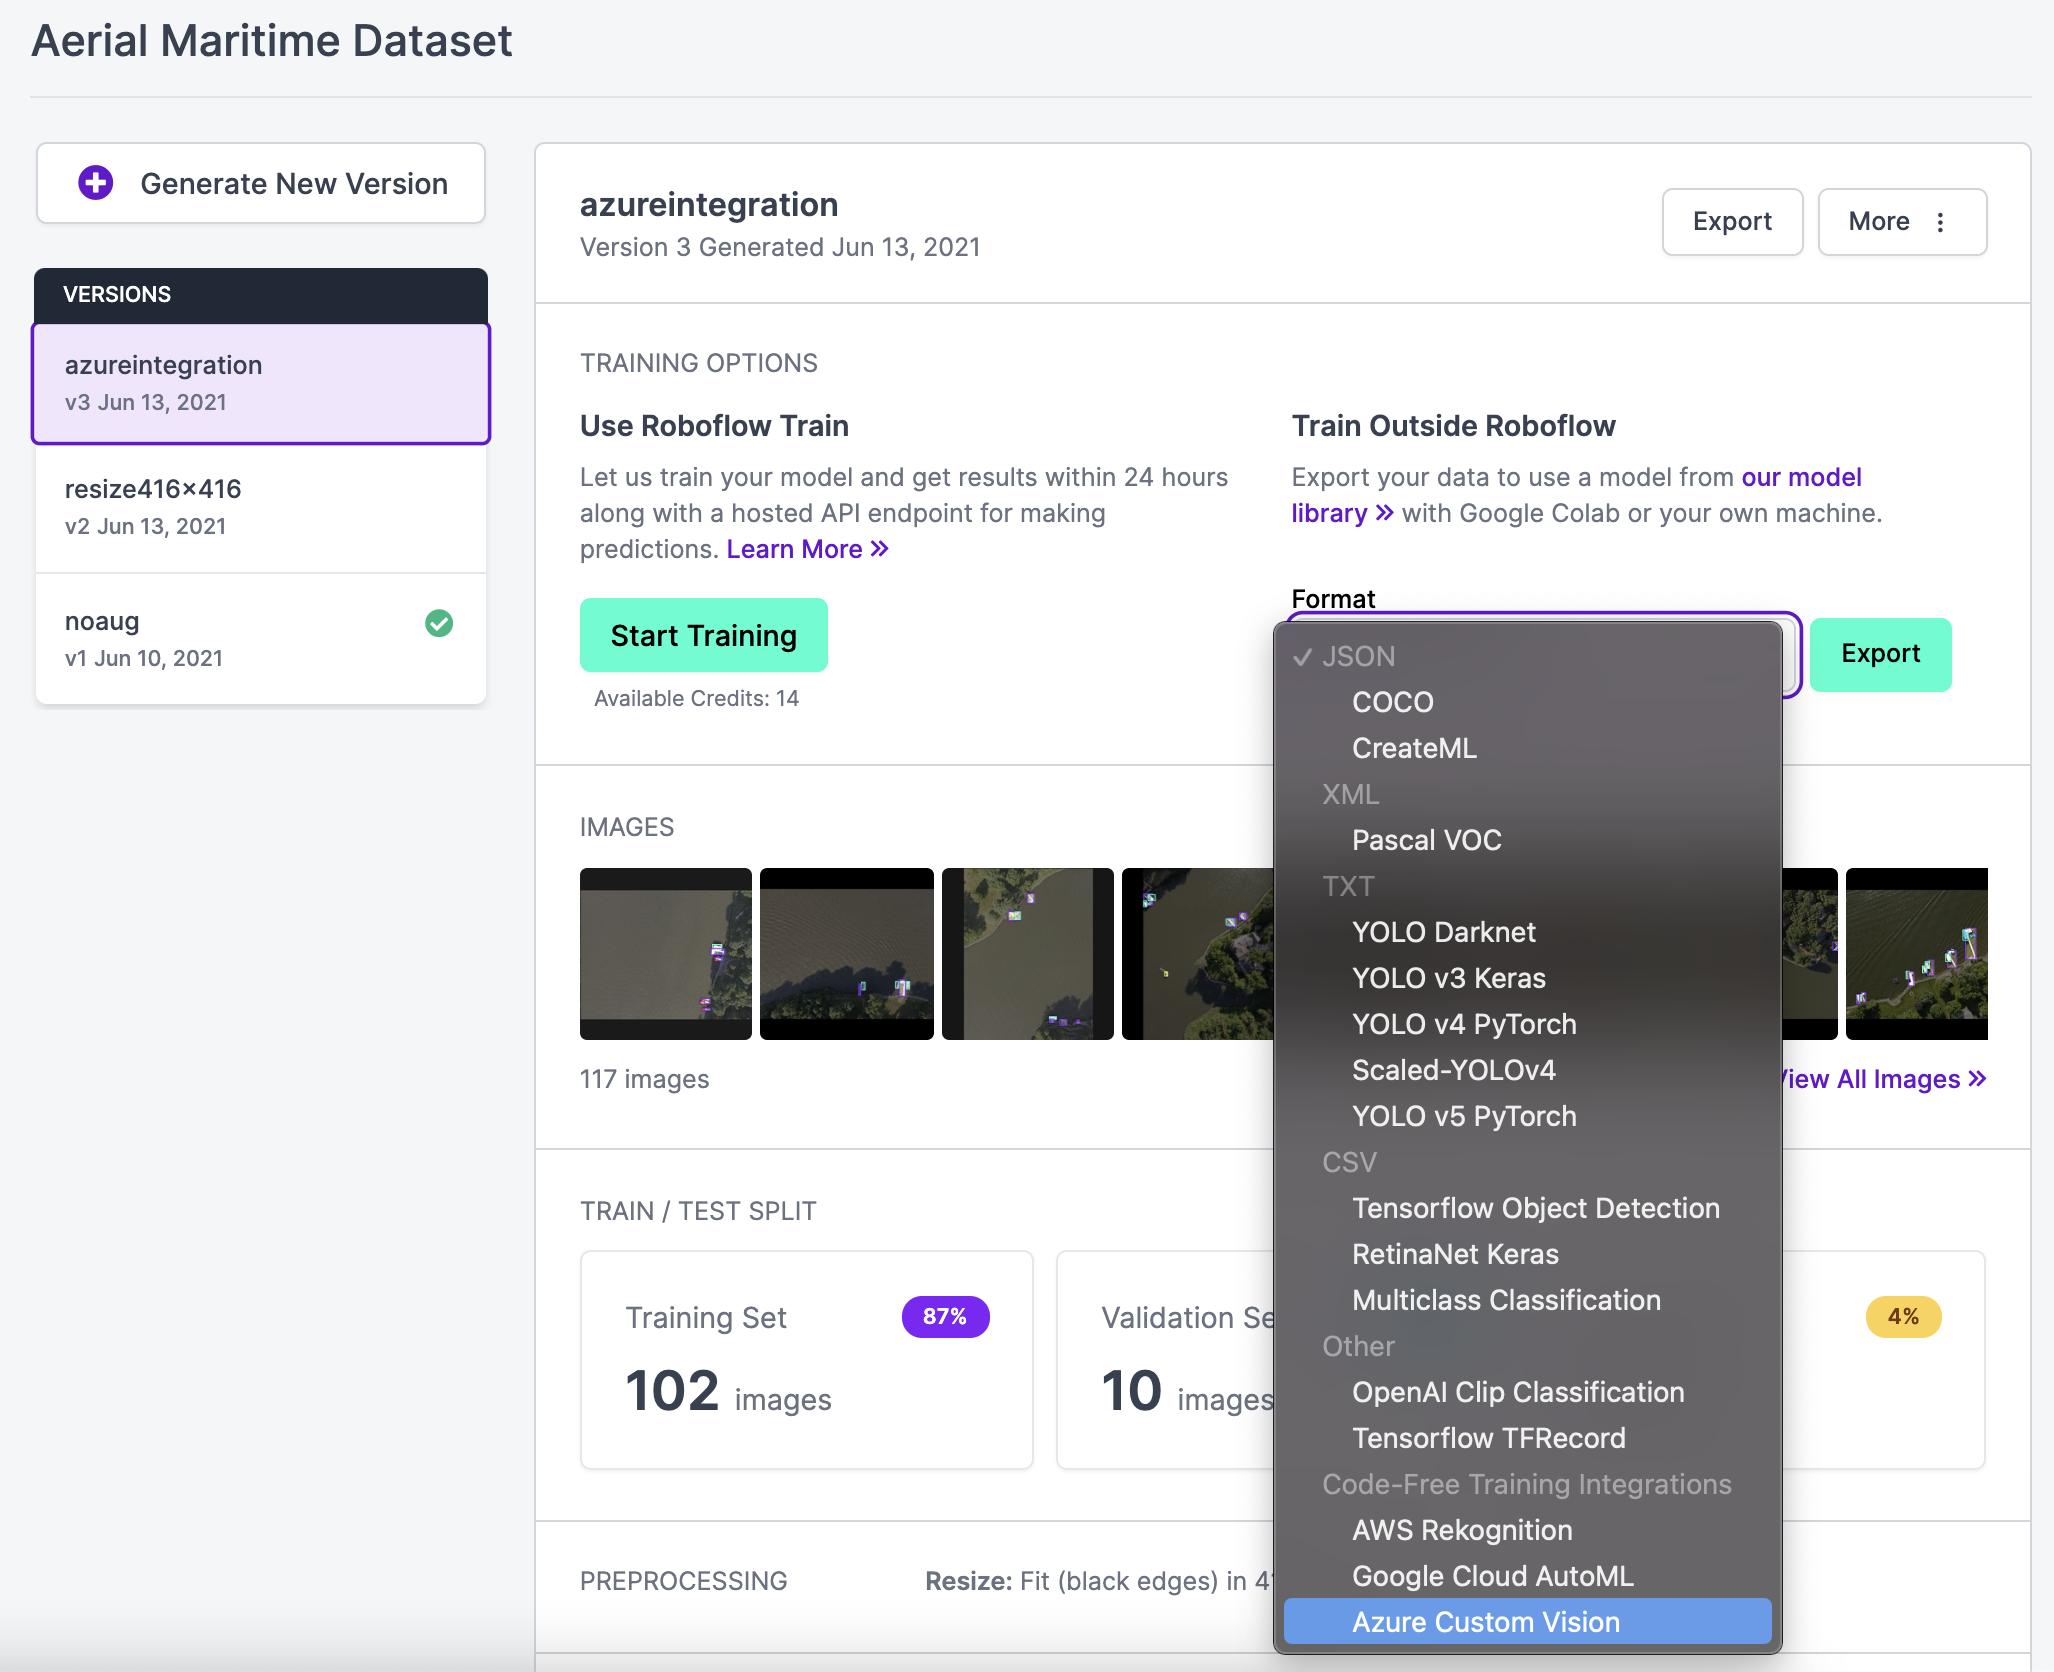 Export data from Roboflow as Azure Custom Vision.